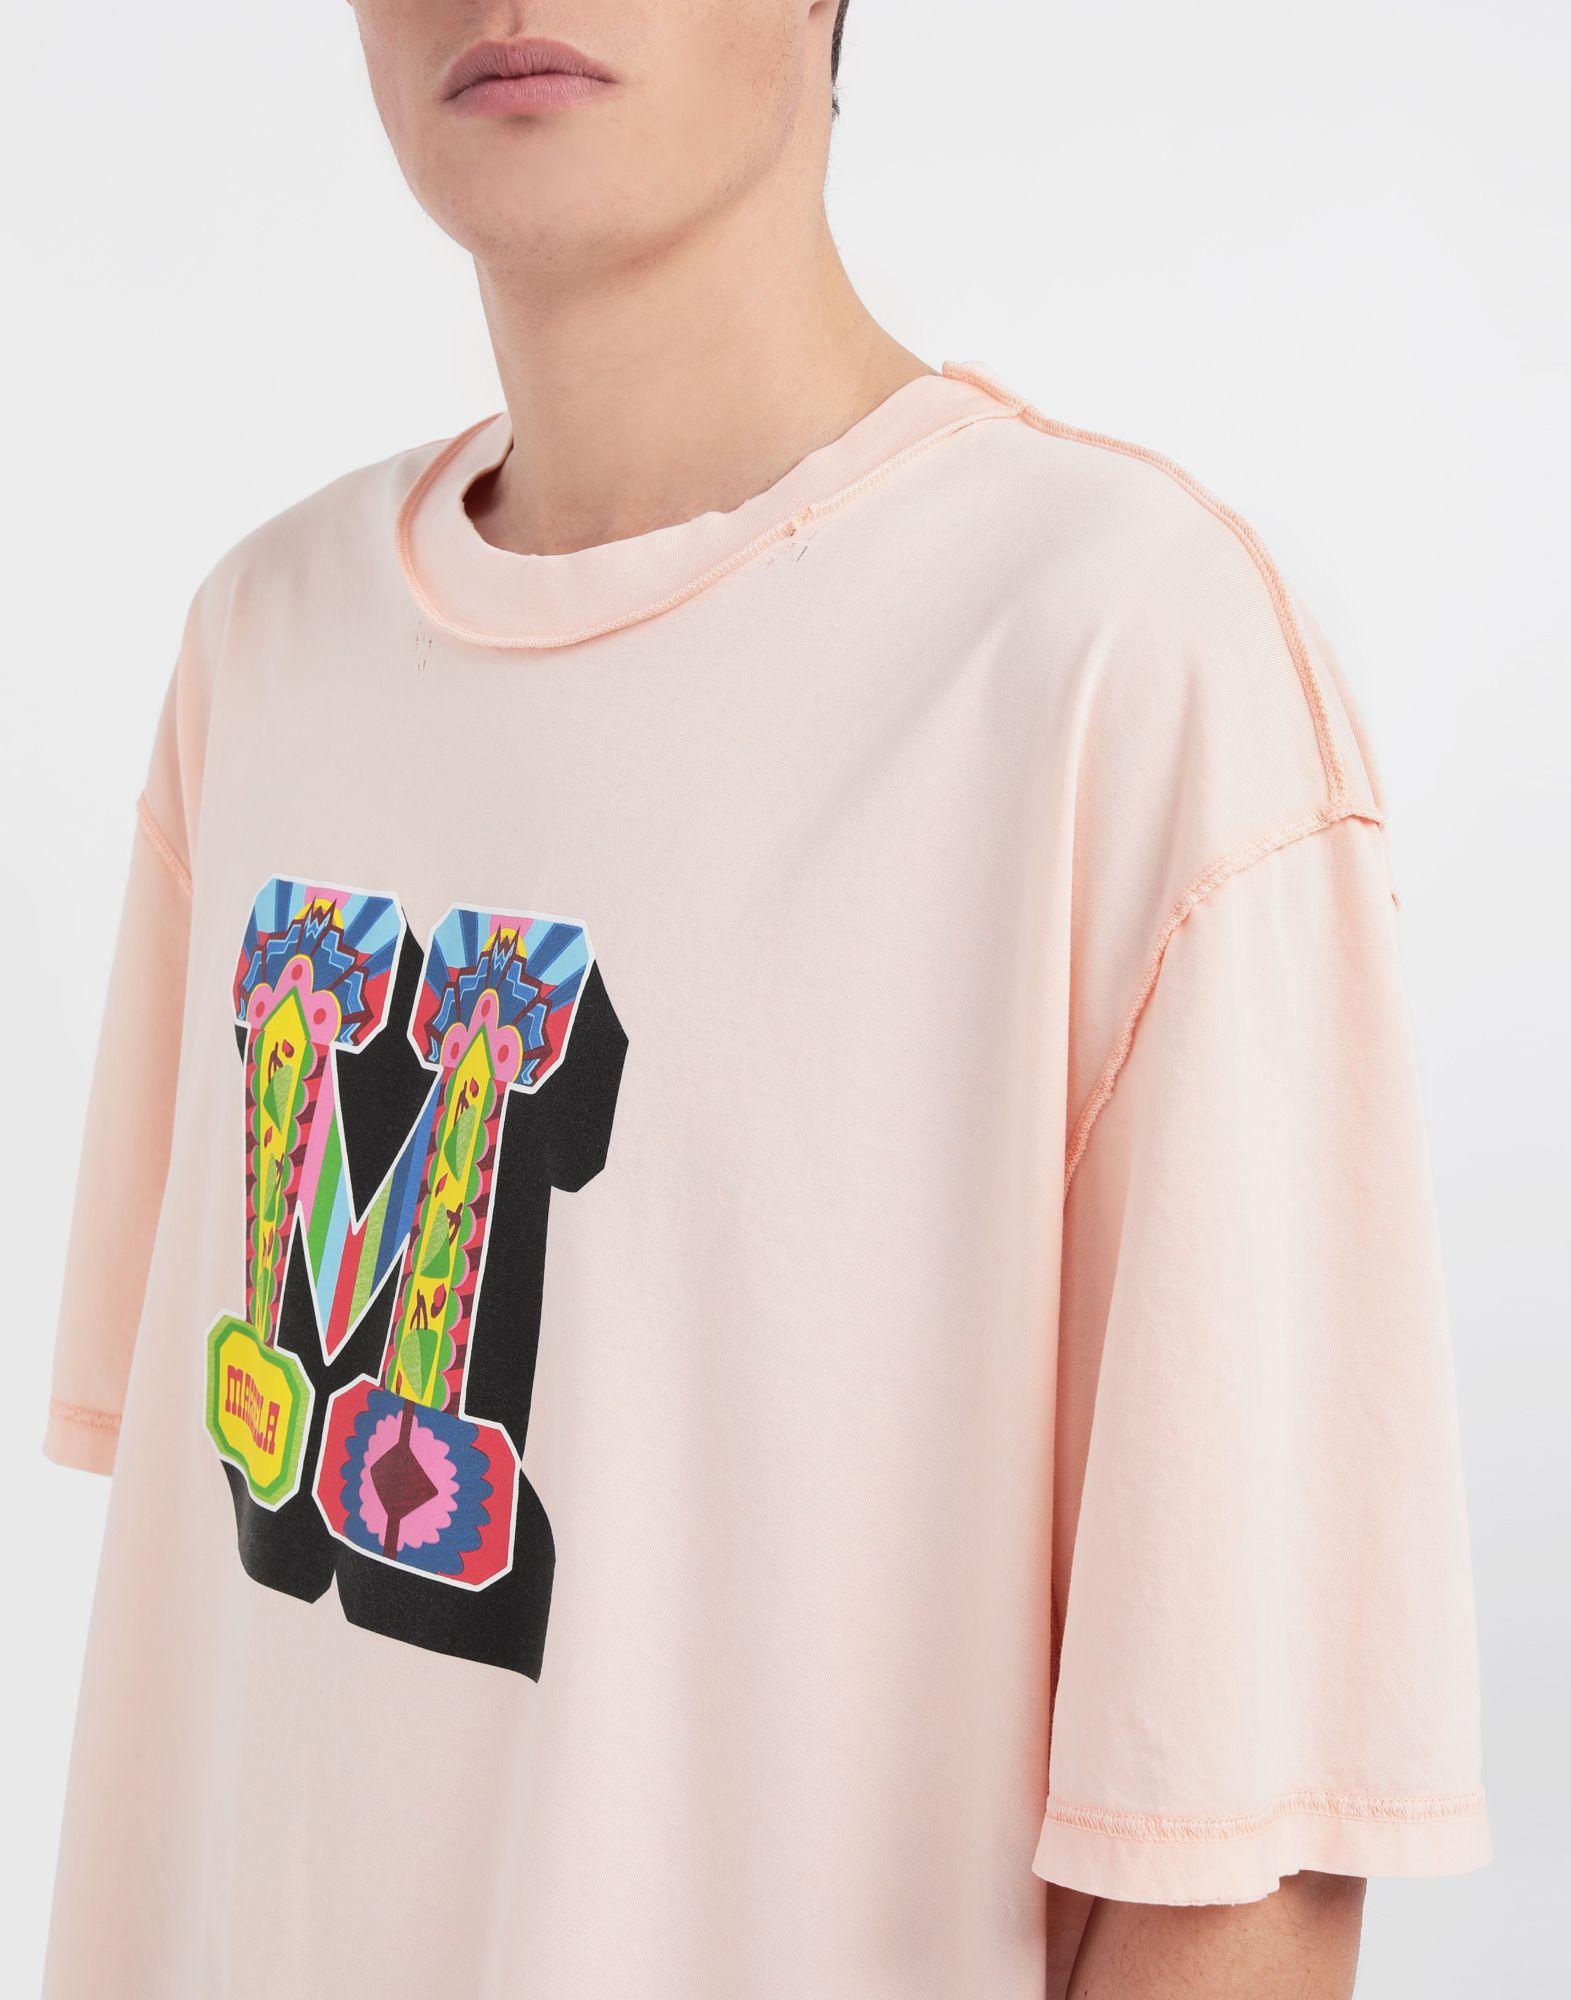 MAISON MARGIELA M logo printed T-shirt Short sleeve t-shirt Man a